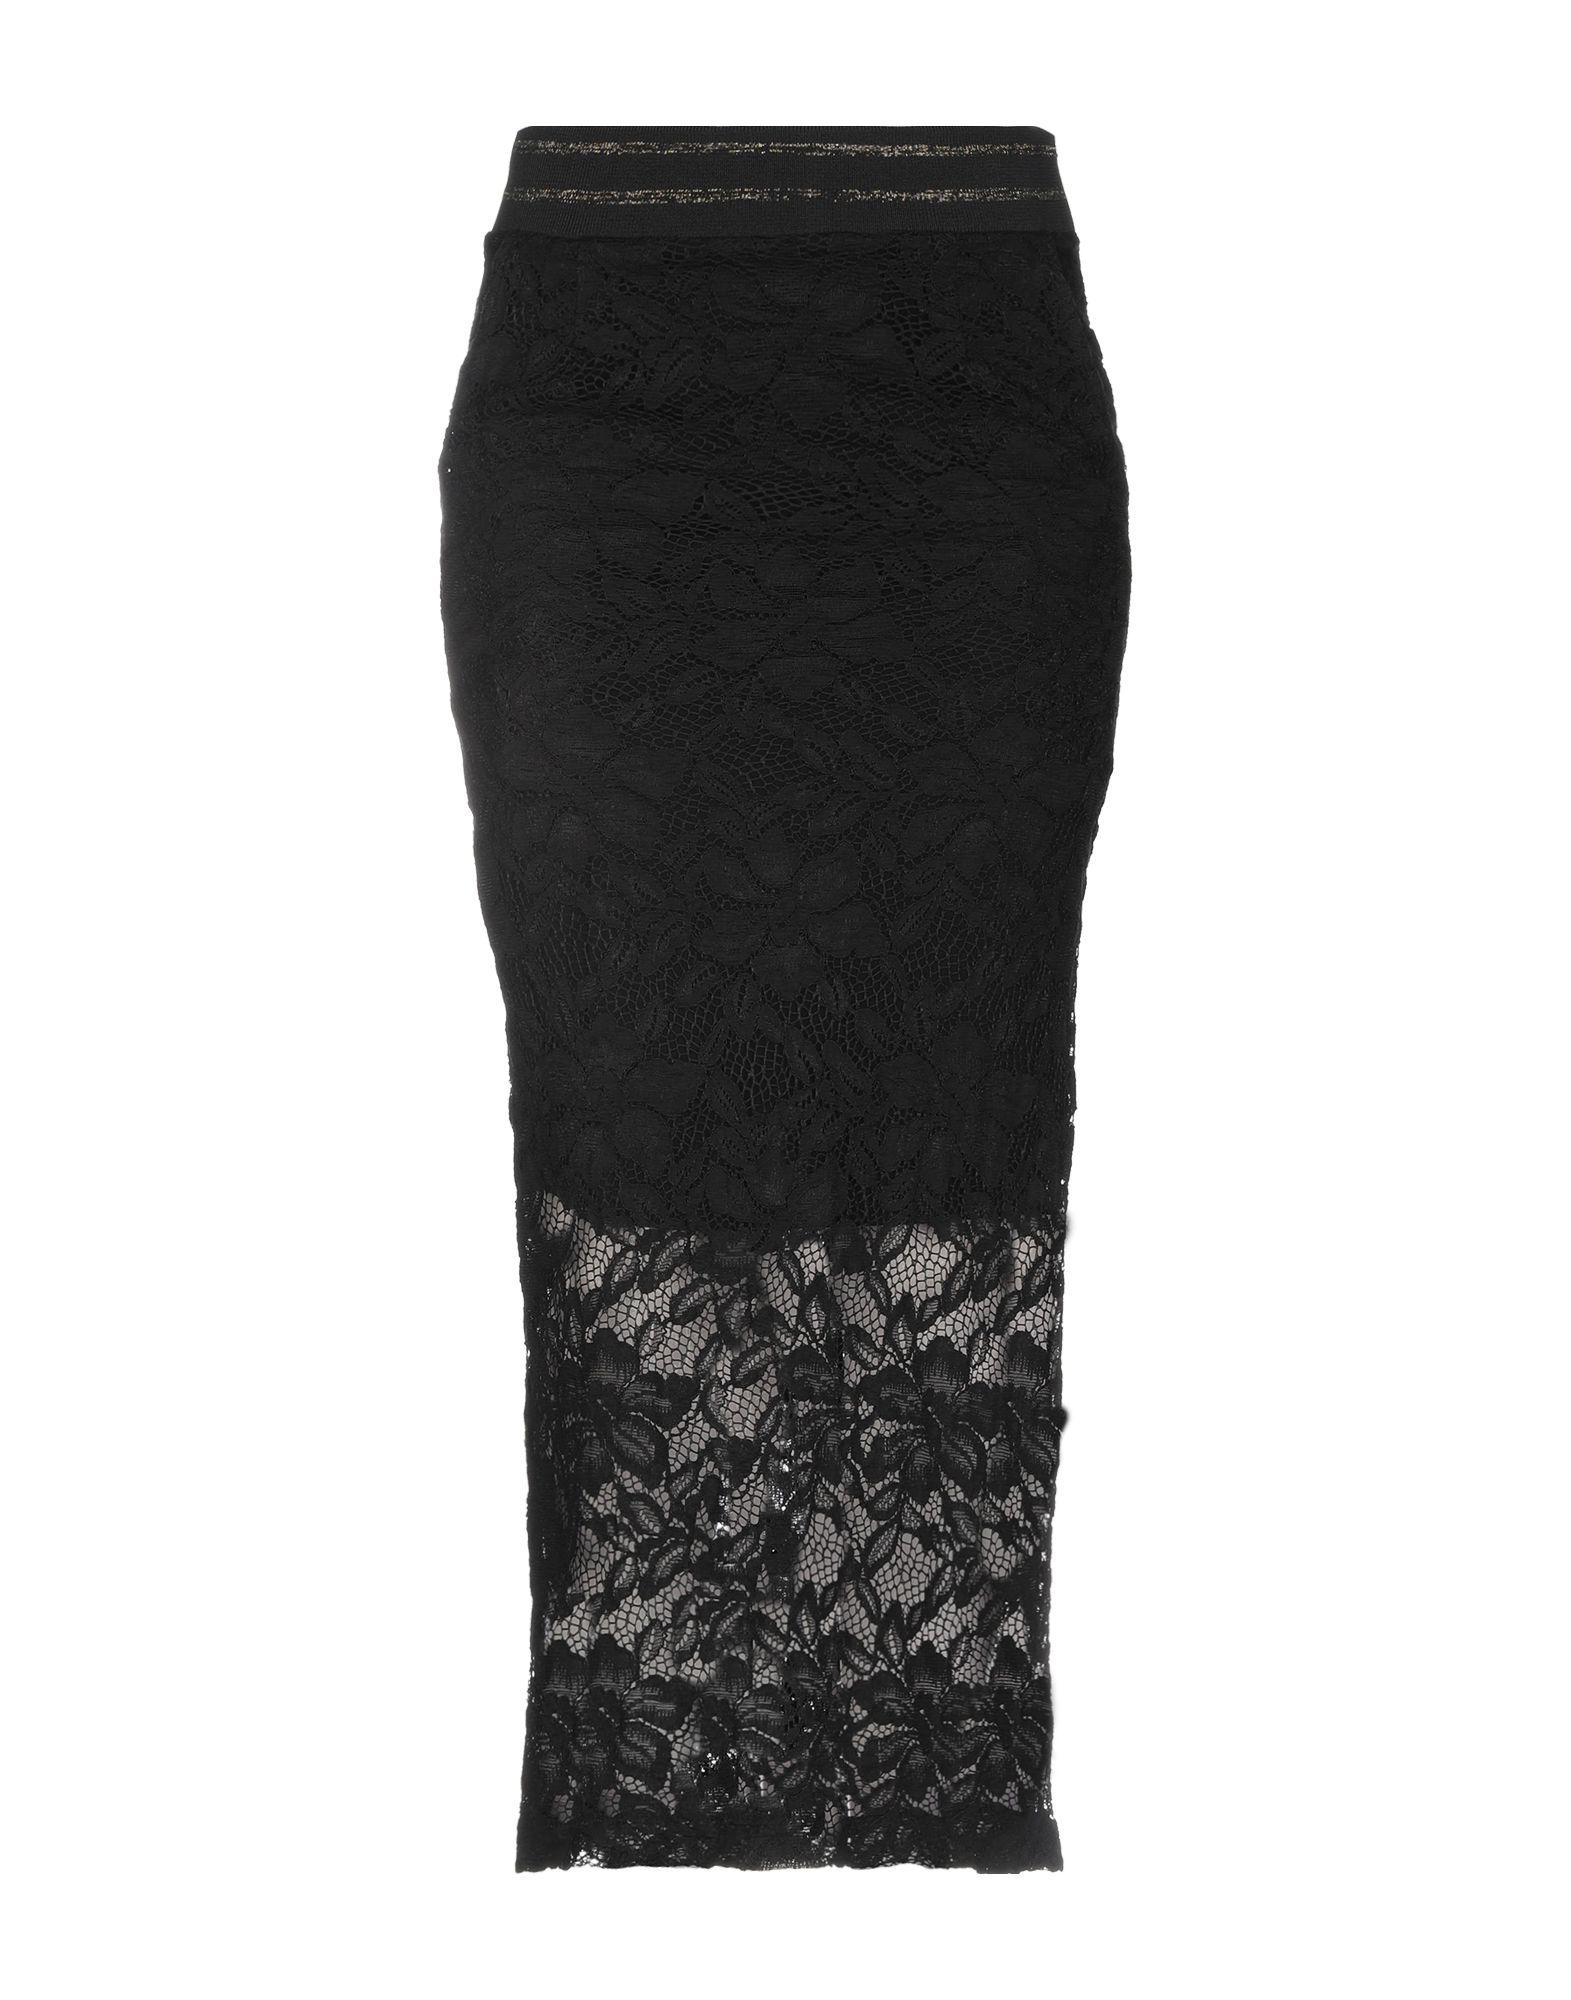 KIMIKA Длинная юбка коляска модульная vikalex ferrone 2 в 1 leather white vi72301